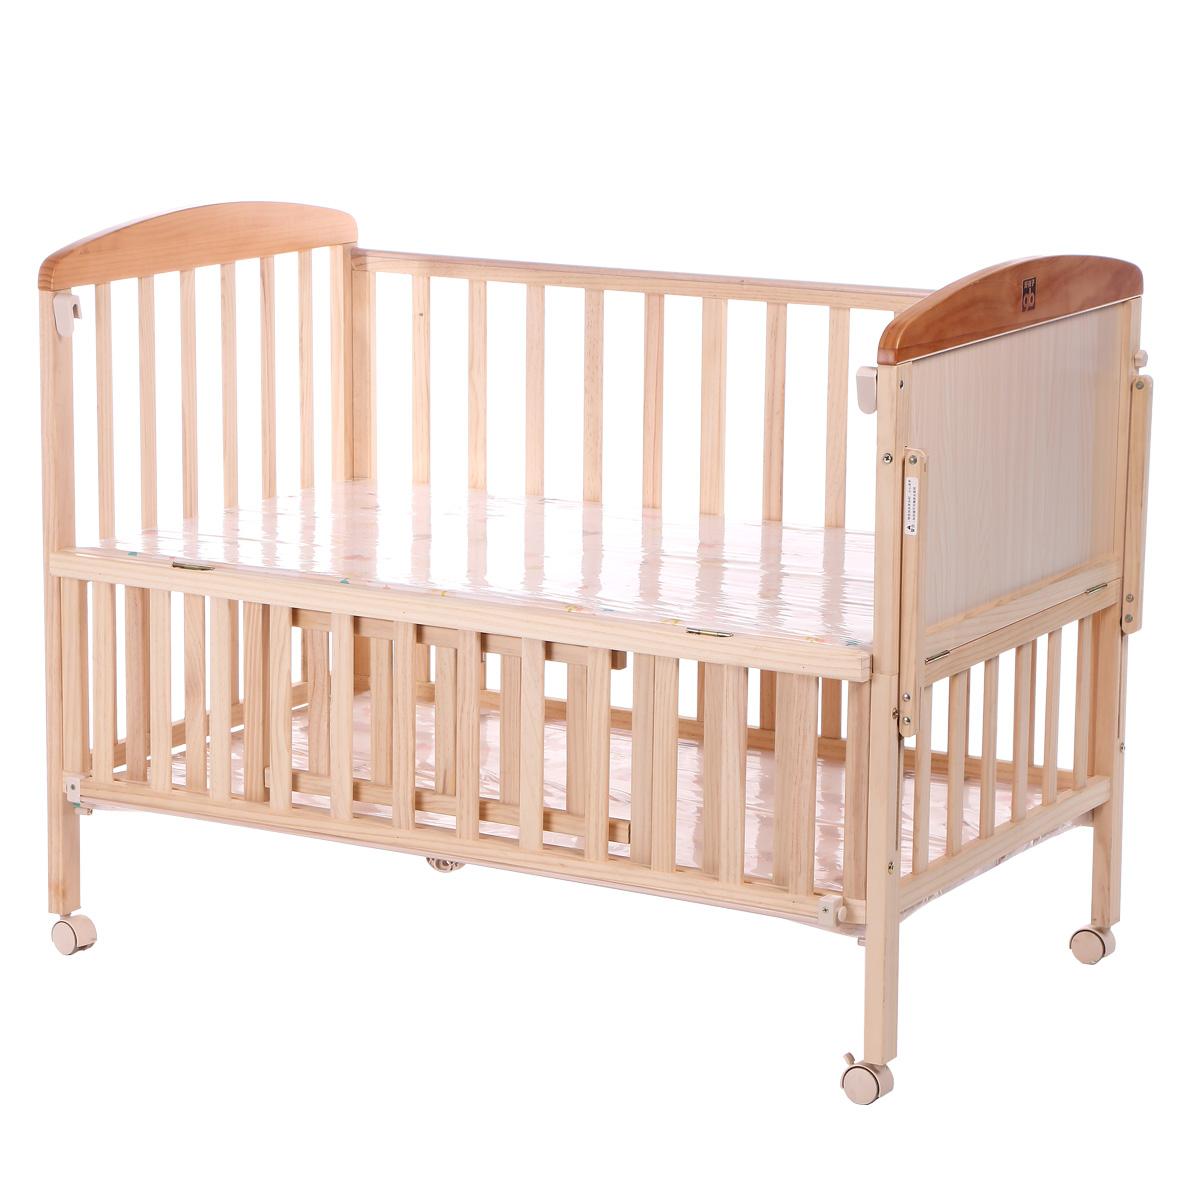 GB καλά παιδιά μωρό κρεβάτι ξύλο χωρίς μπογιά το μωρό το λίκνο της πολυλειτουργικής τα παιδιά τα στείλω στο κρεβάτι MC283 κουνουπιέρες